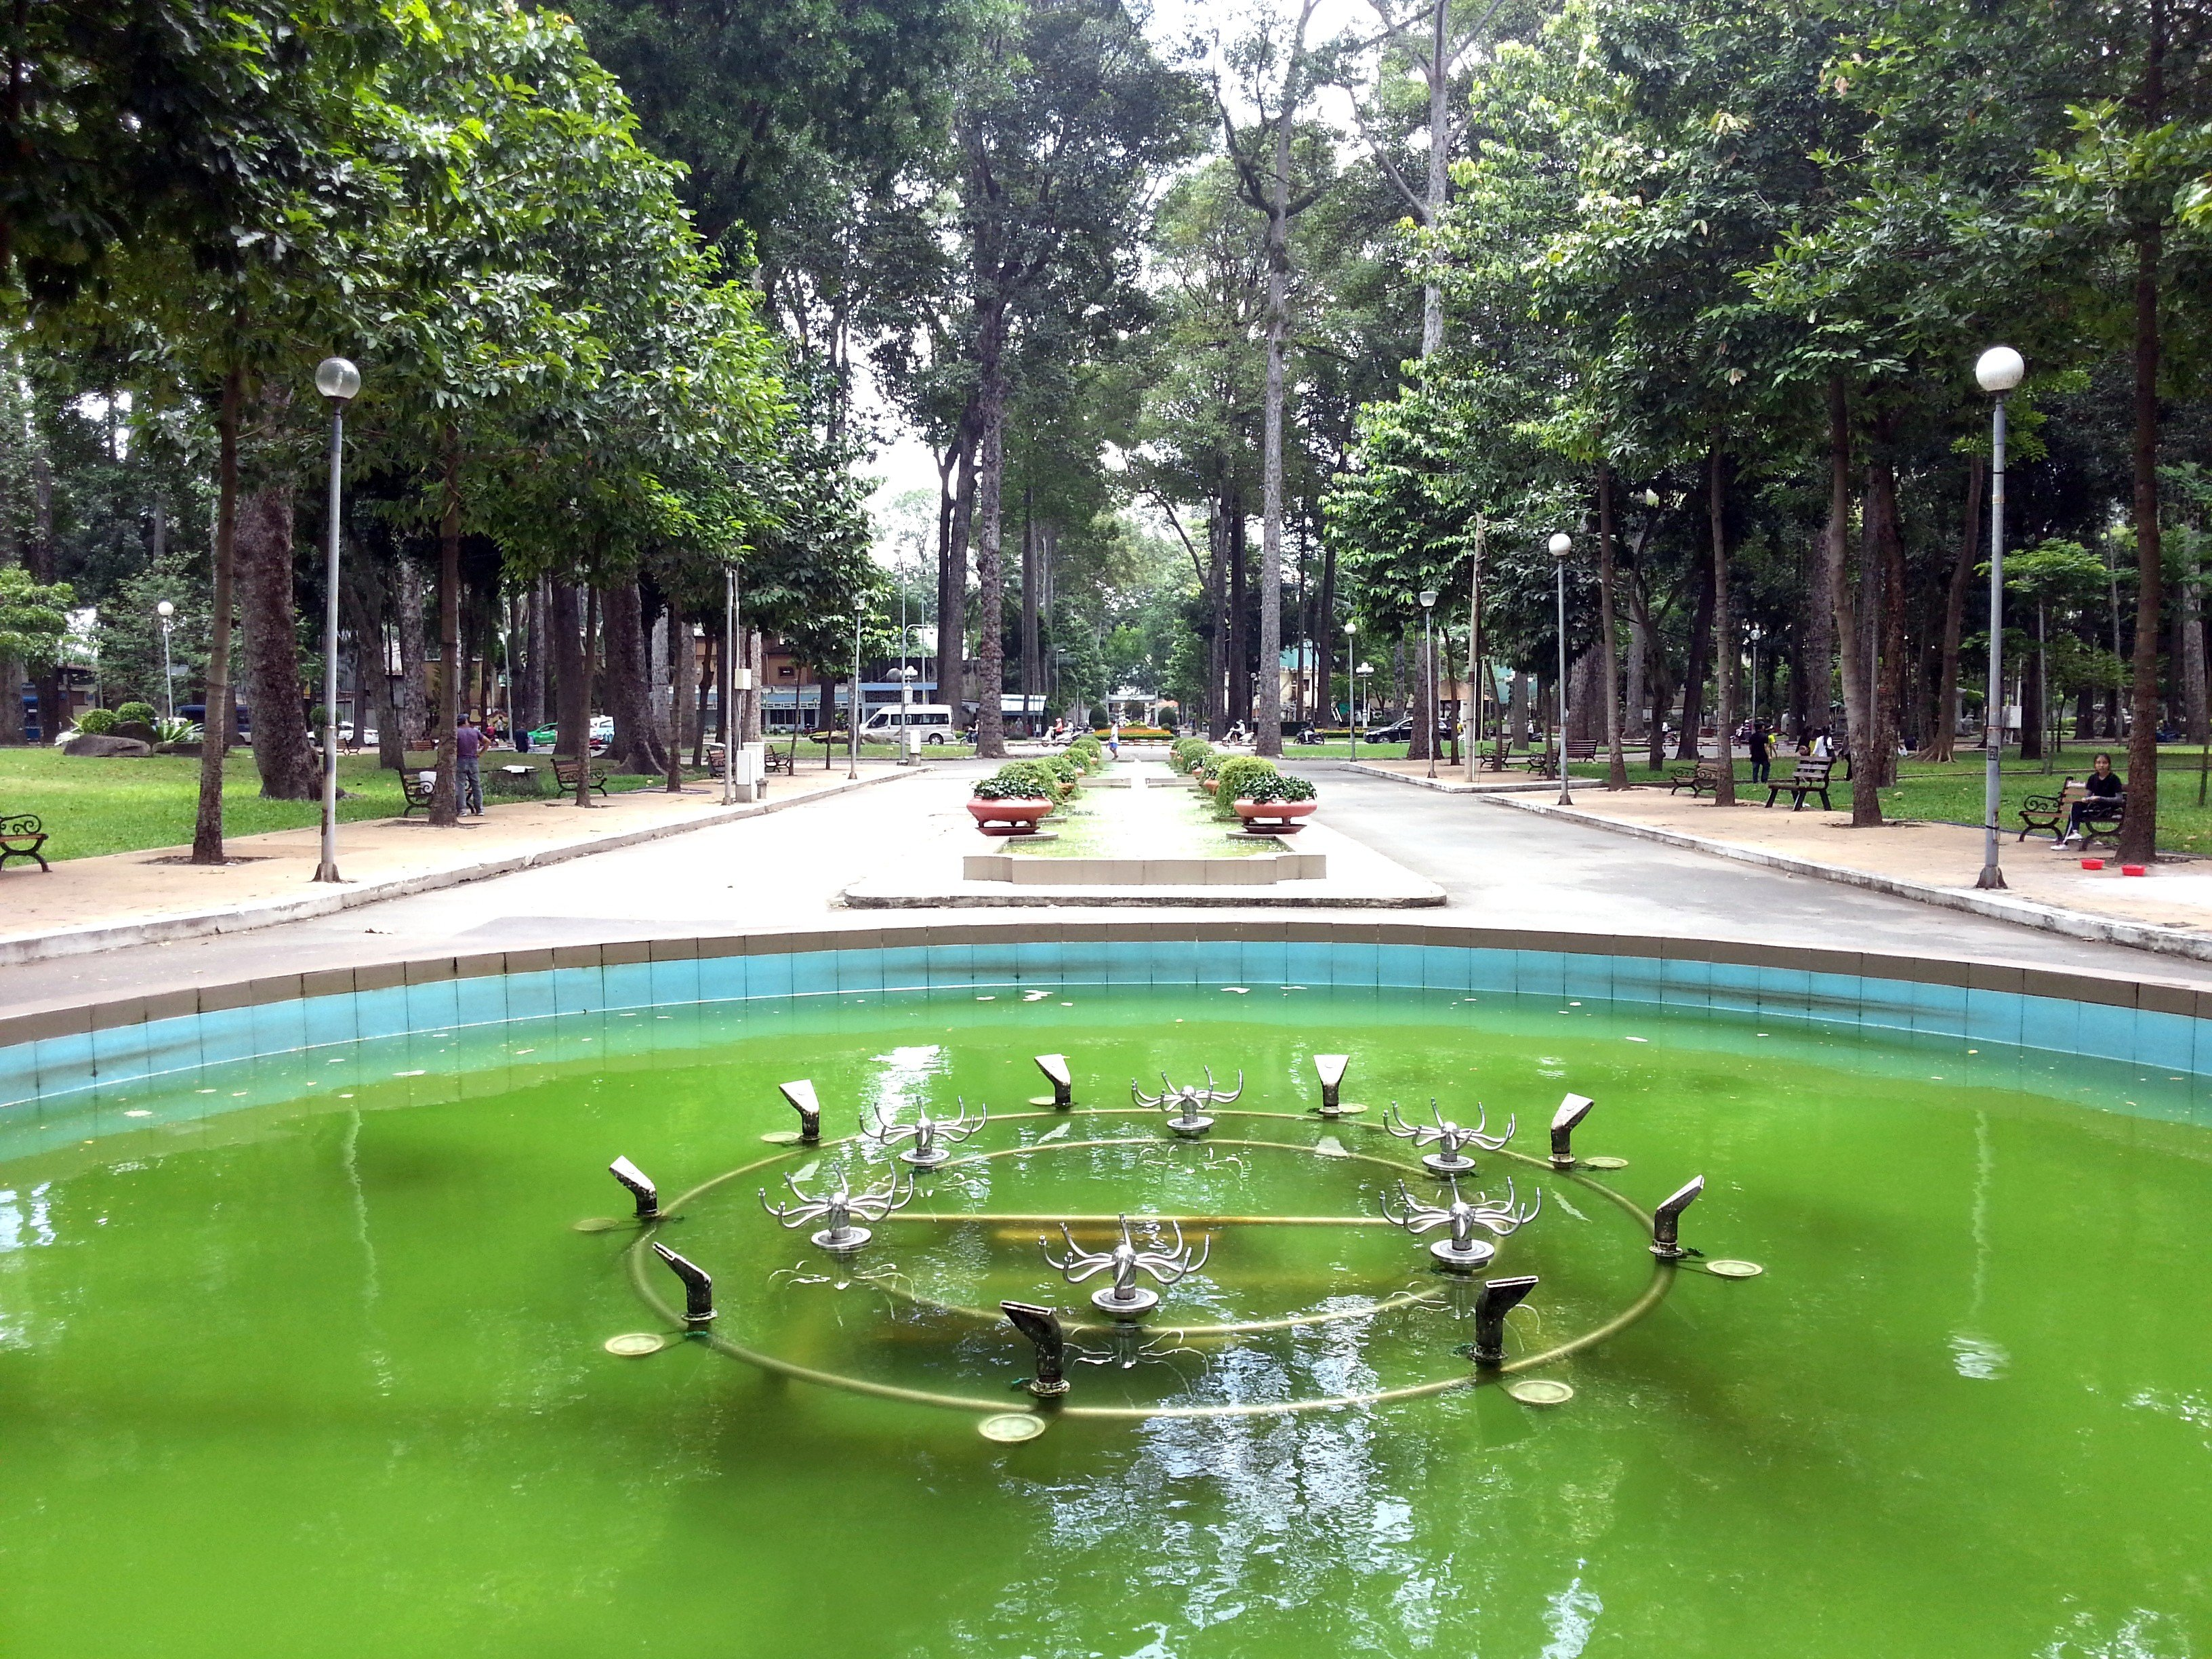 Leafy walkways in Tao Dan Park